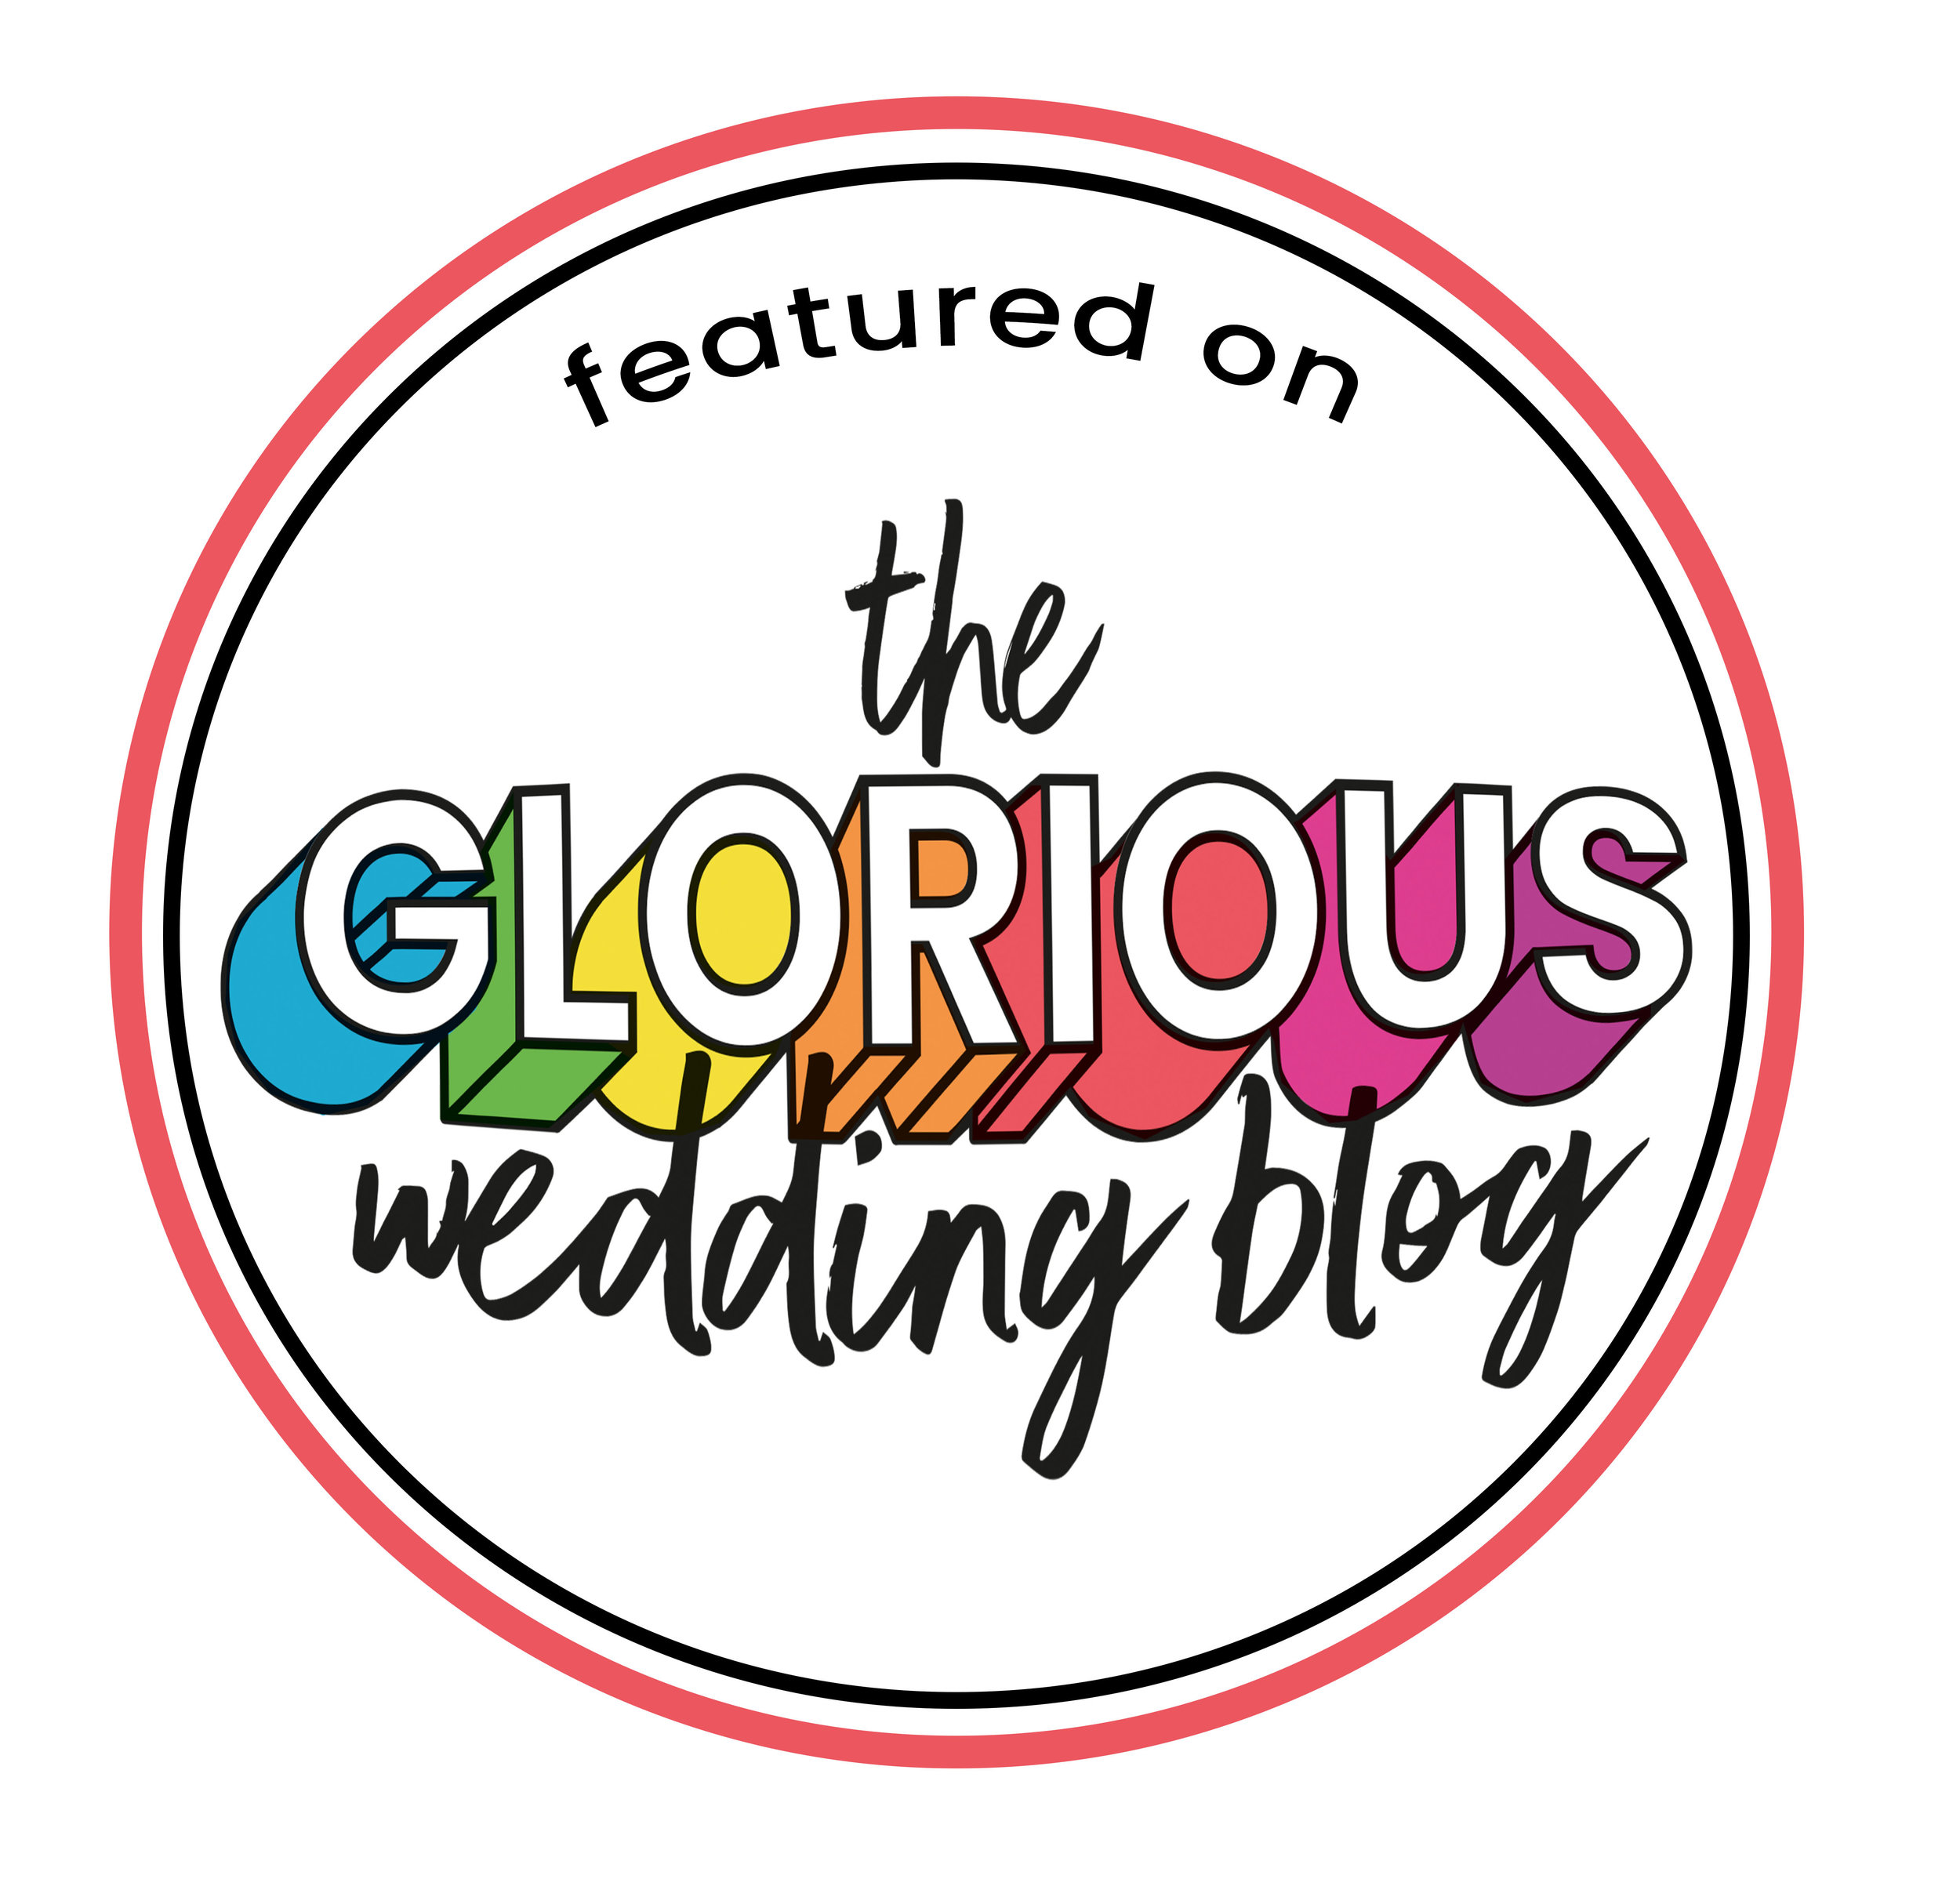 Featured on the Glorious Wedding Blog - Kieran Bellis Photography